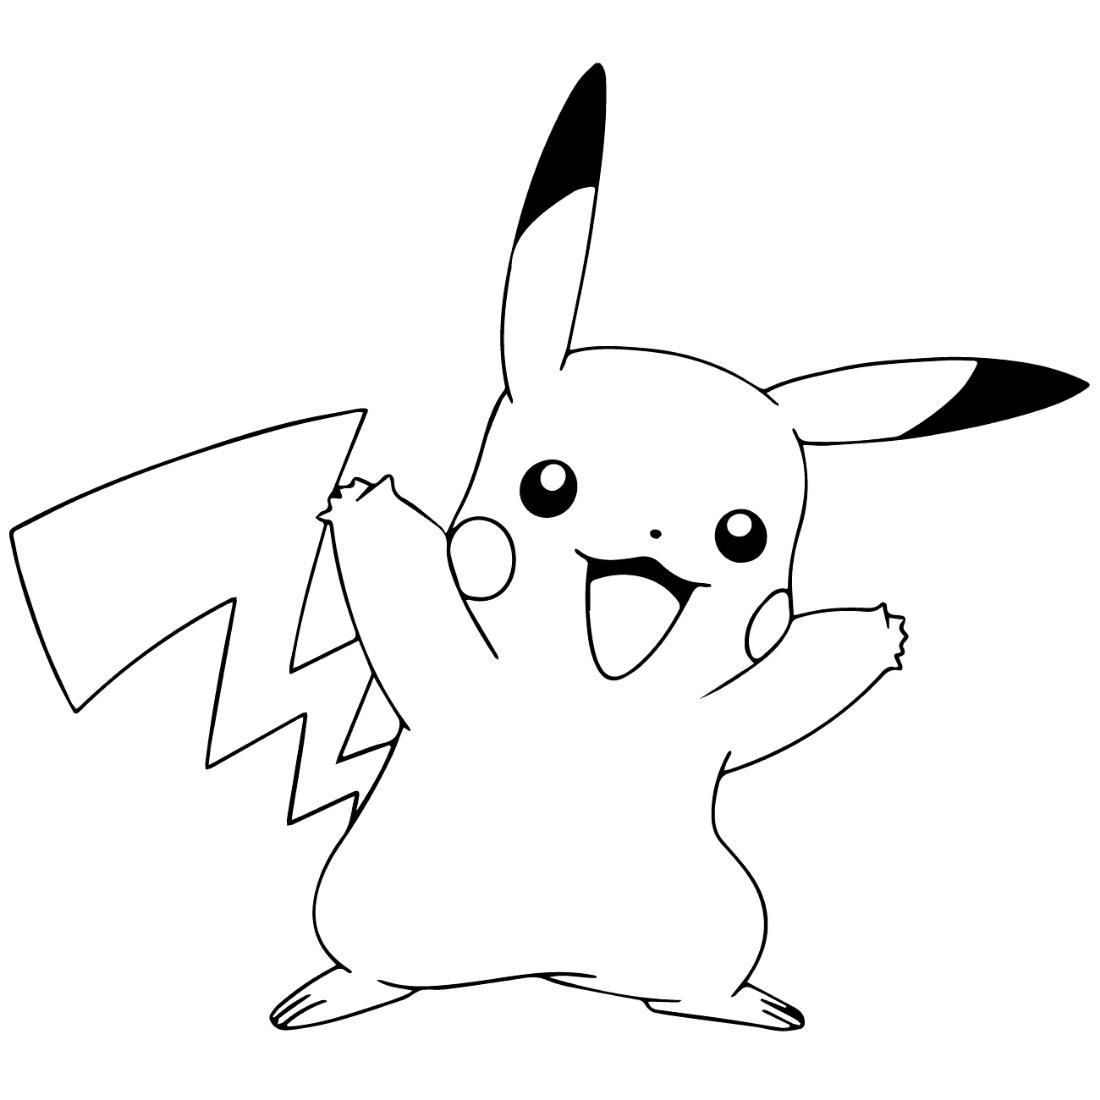 Pokémon GO Pikachu Celebrating